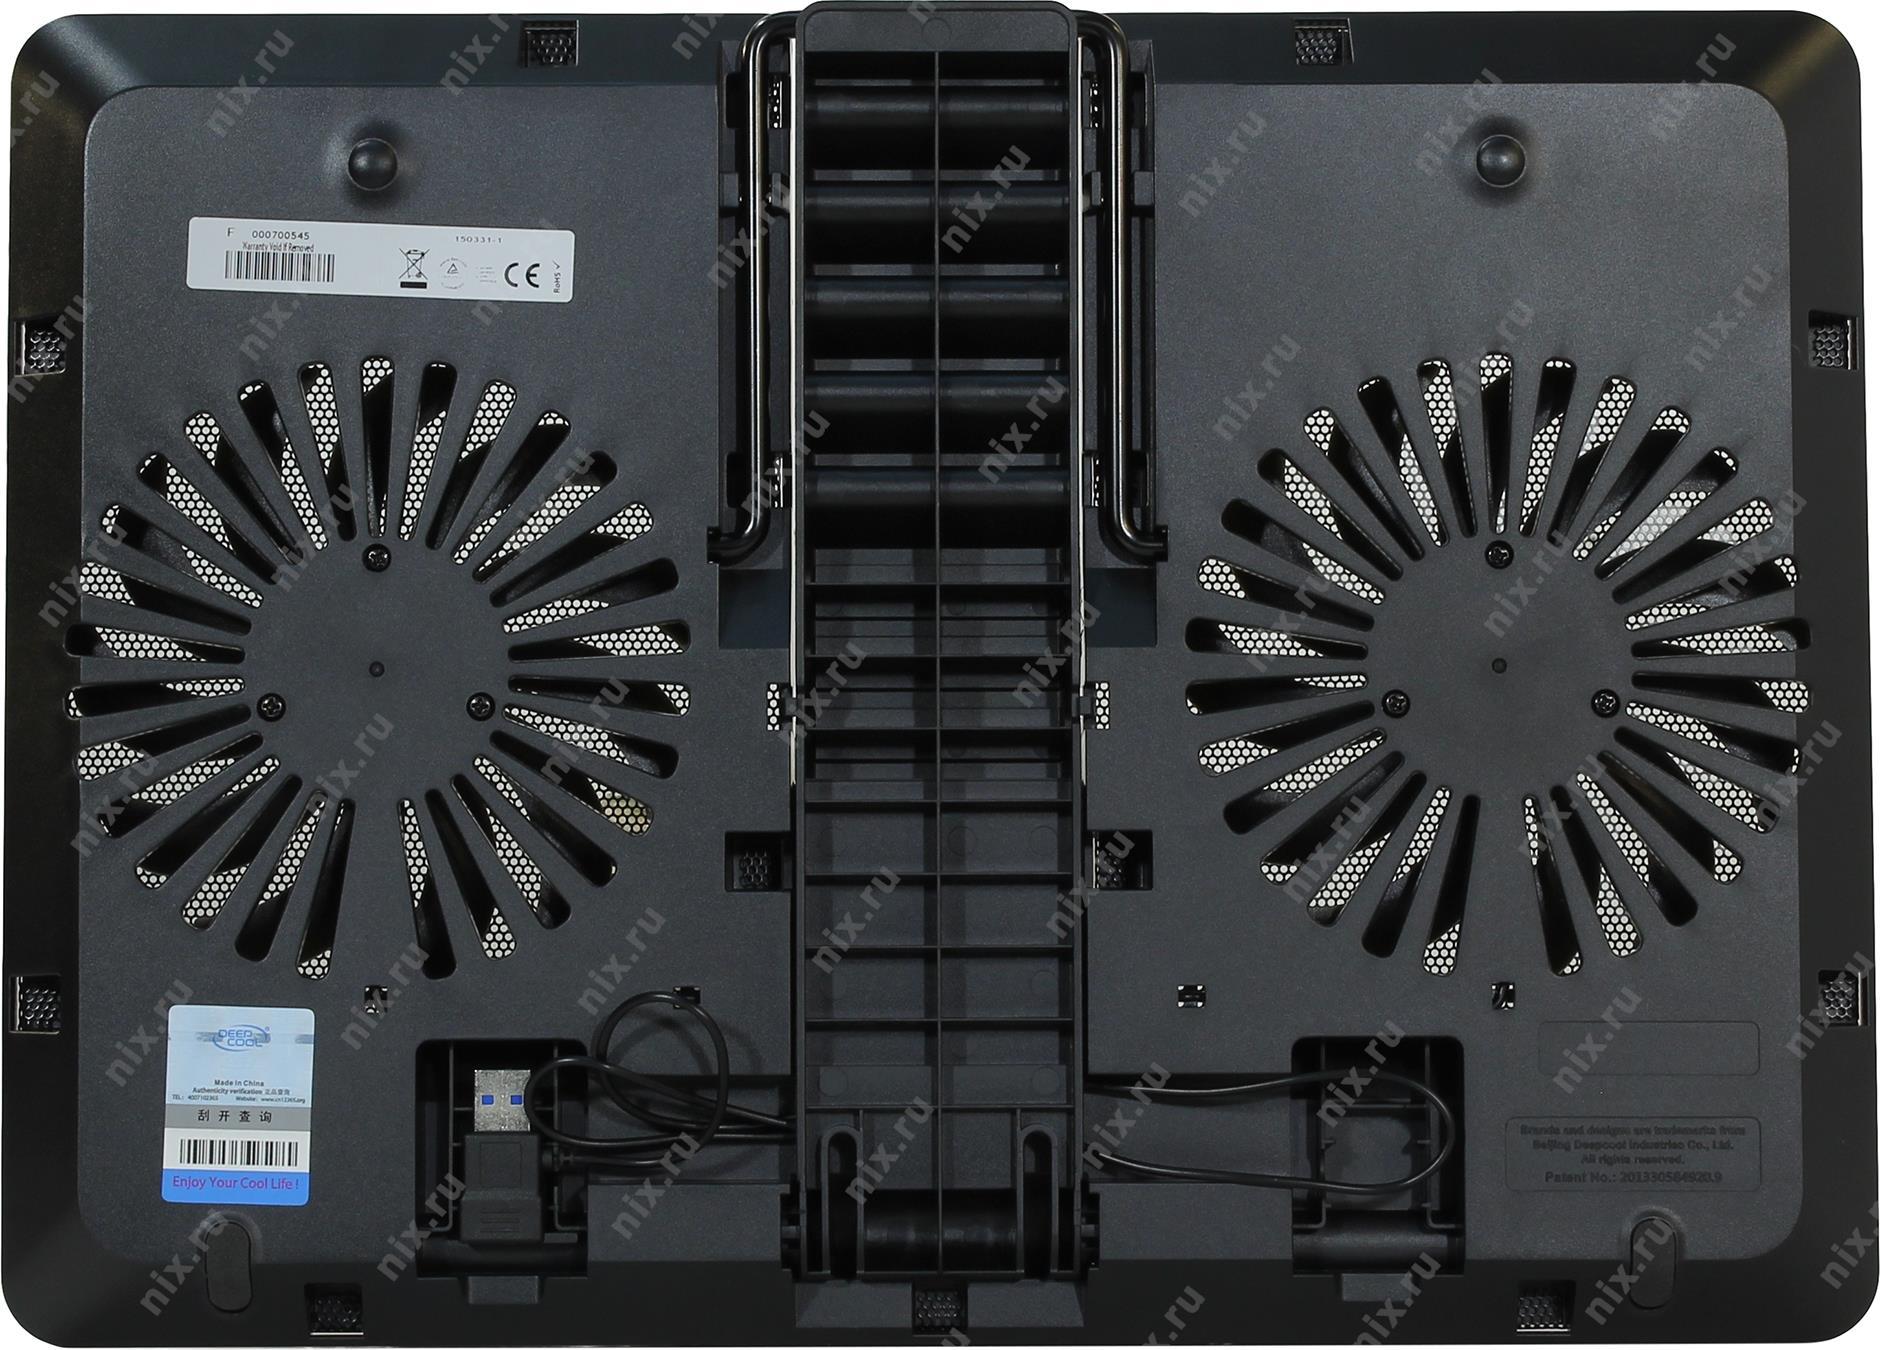 Deepcool U Pal Usb 30 Notebook Cooler Black